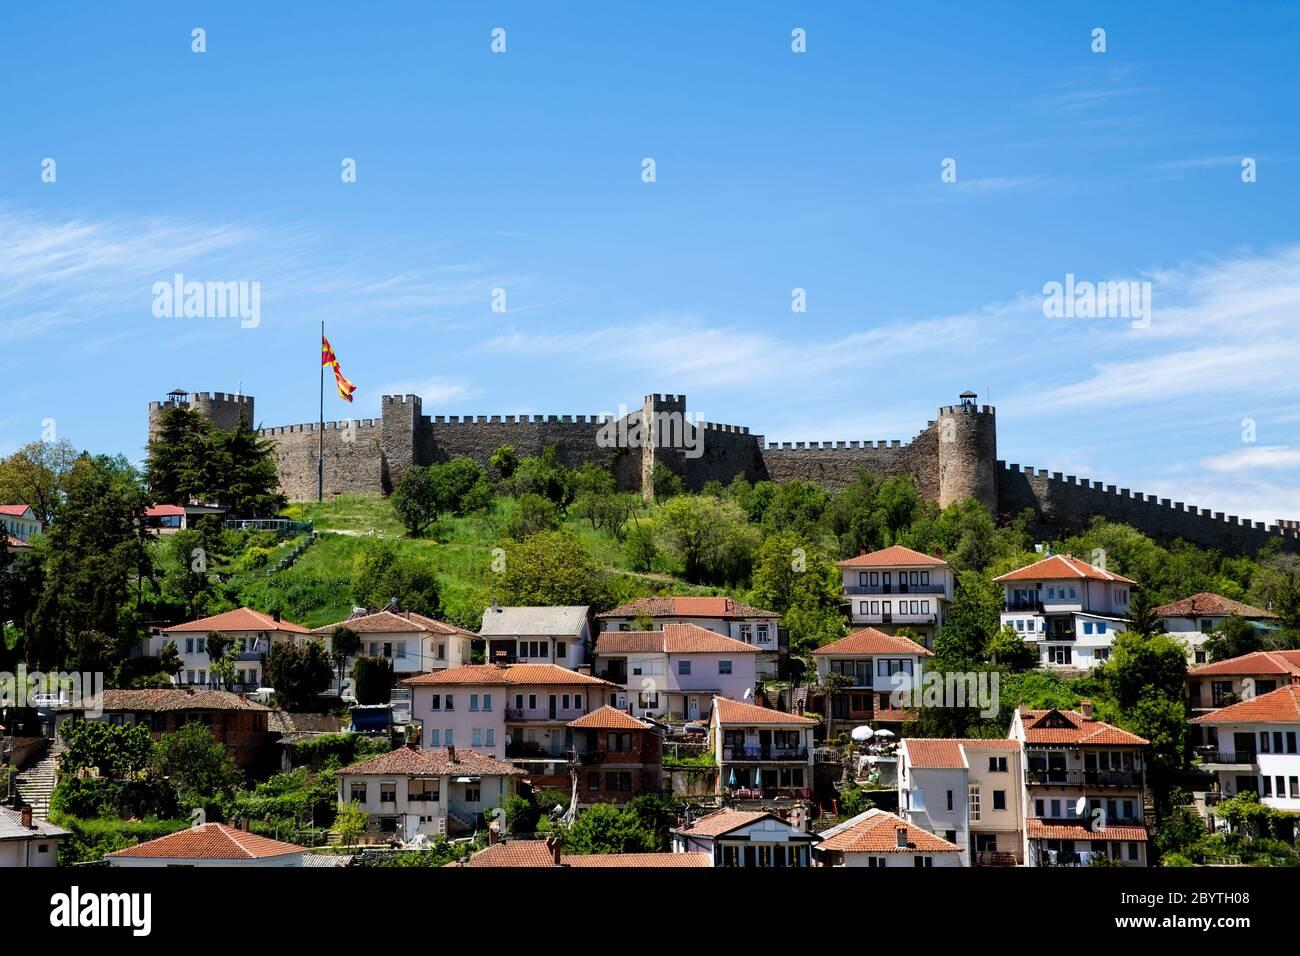 View of Tzar Samuel's Fortress, City of Ohrid, Republic of North Macedonia (FYROM) Stock Photo